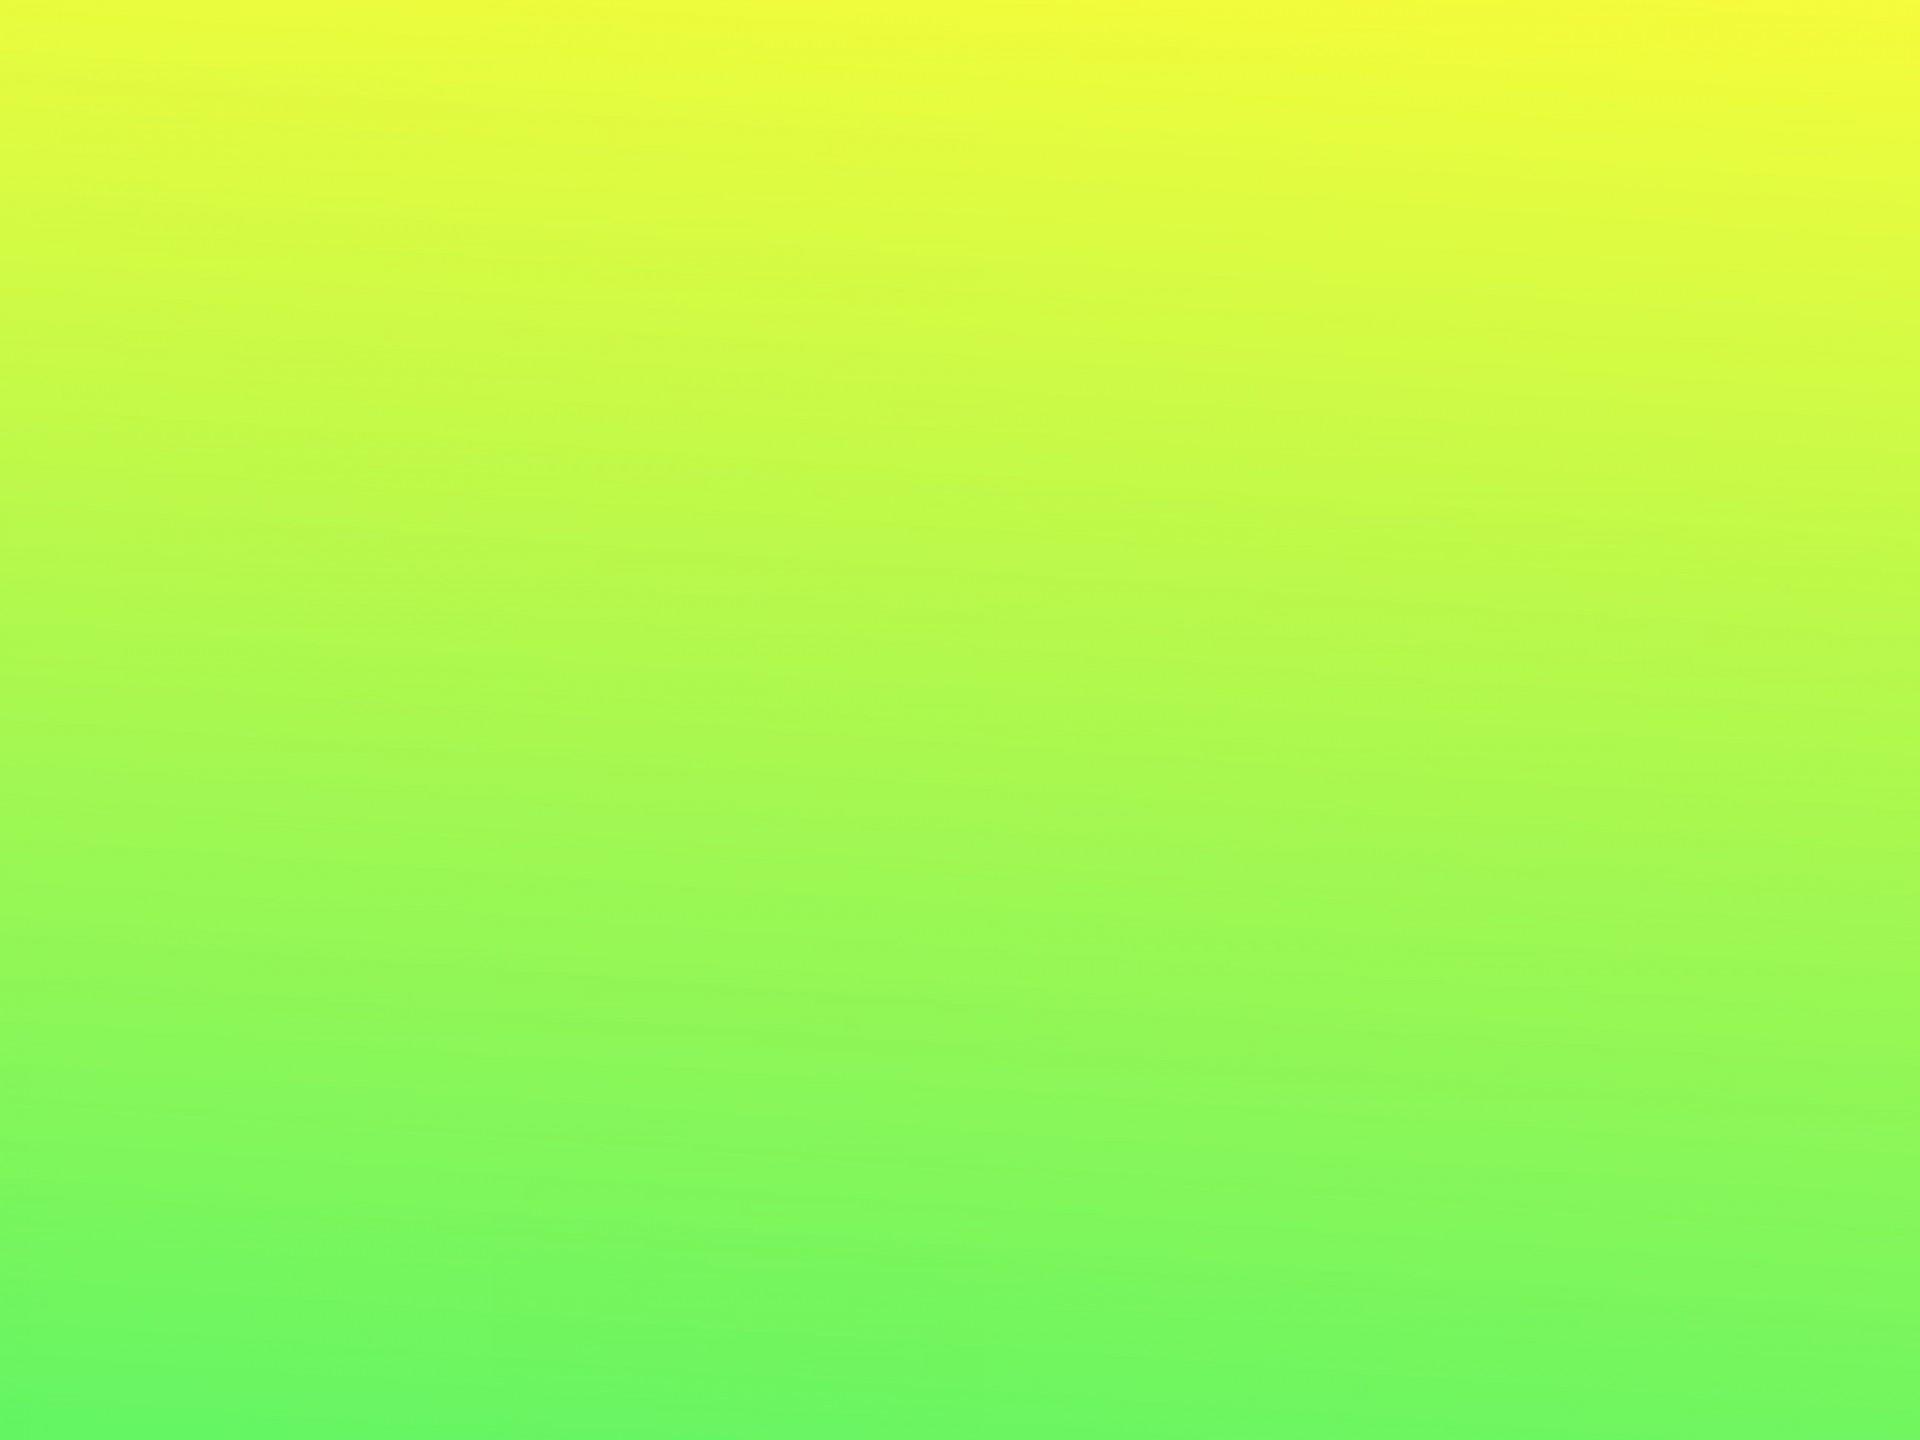 yellow-green-background